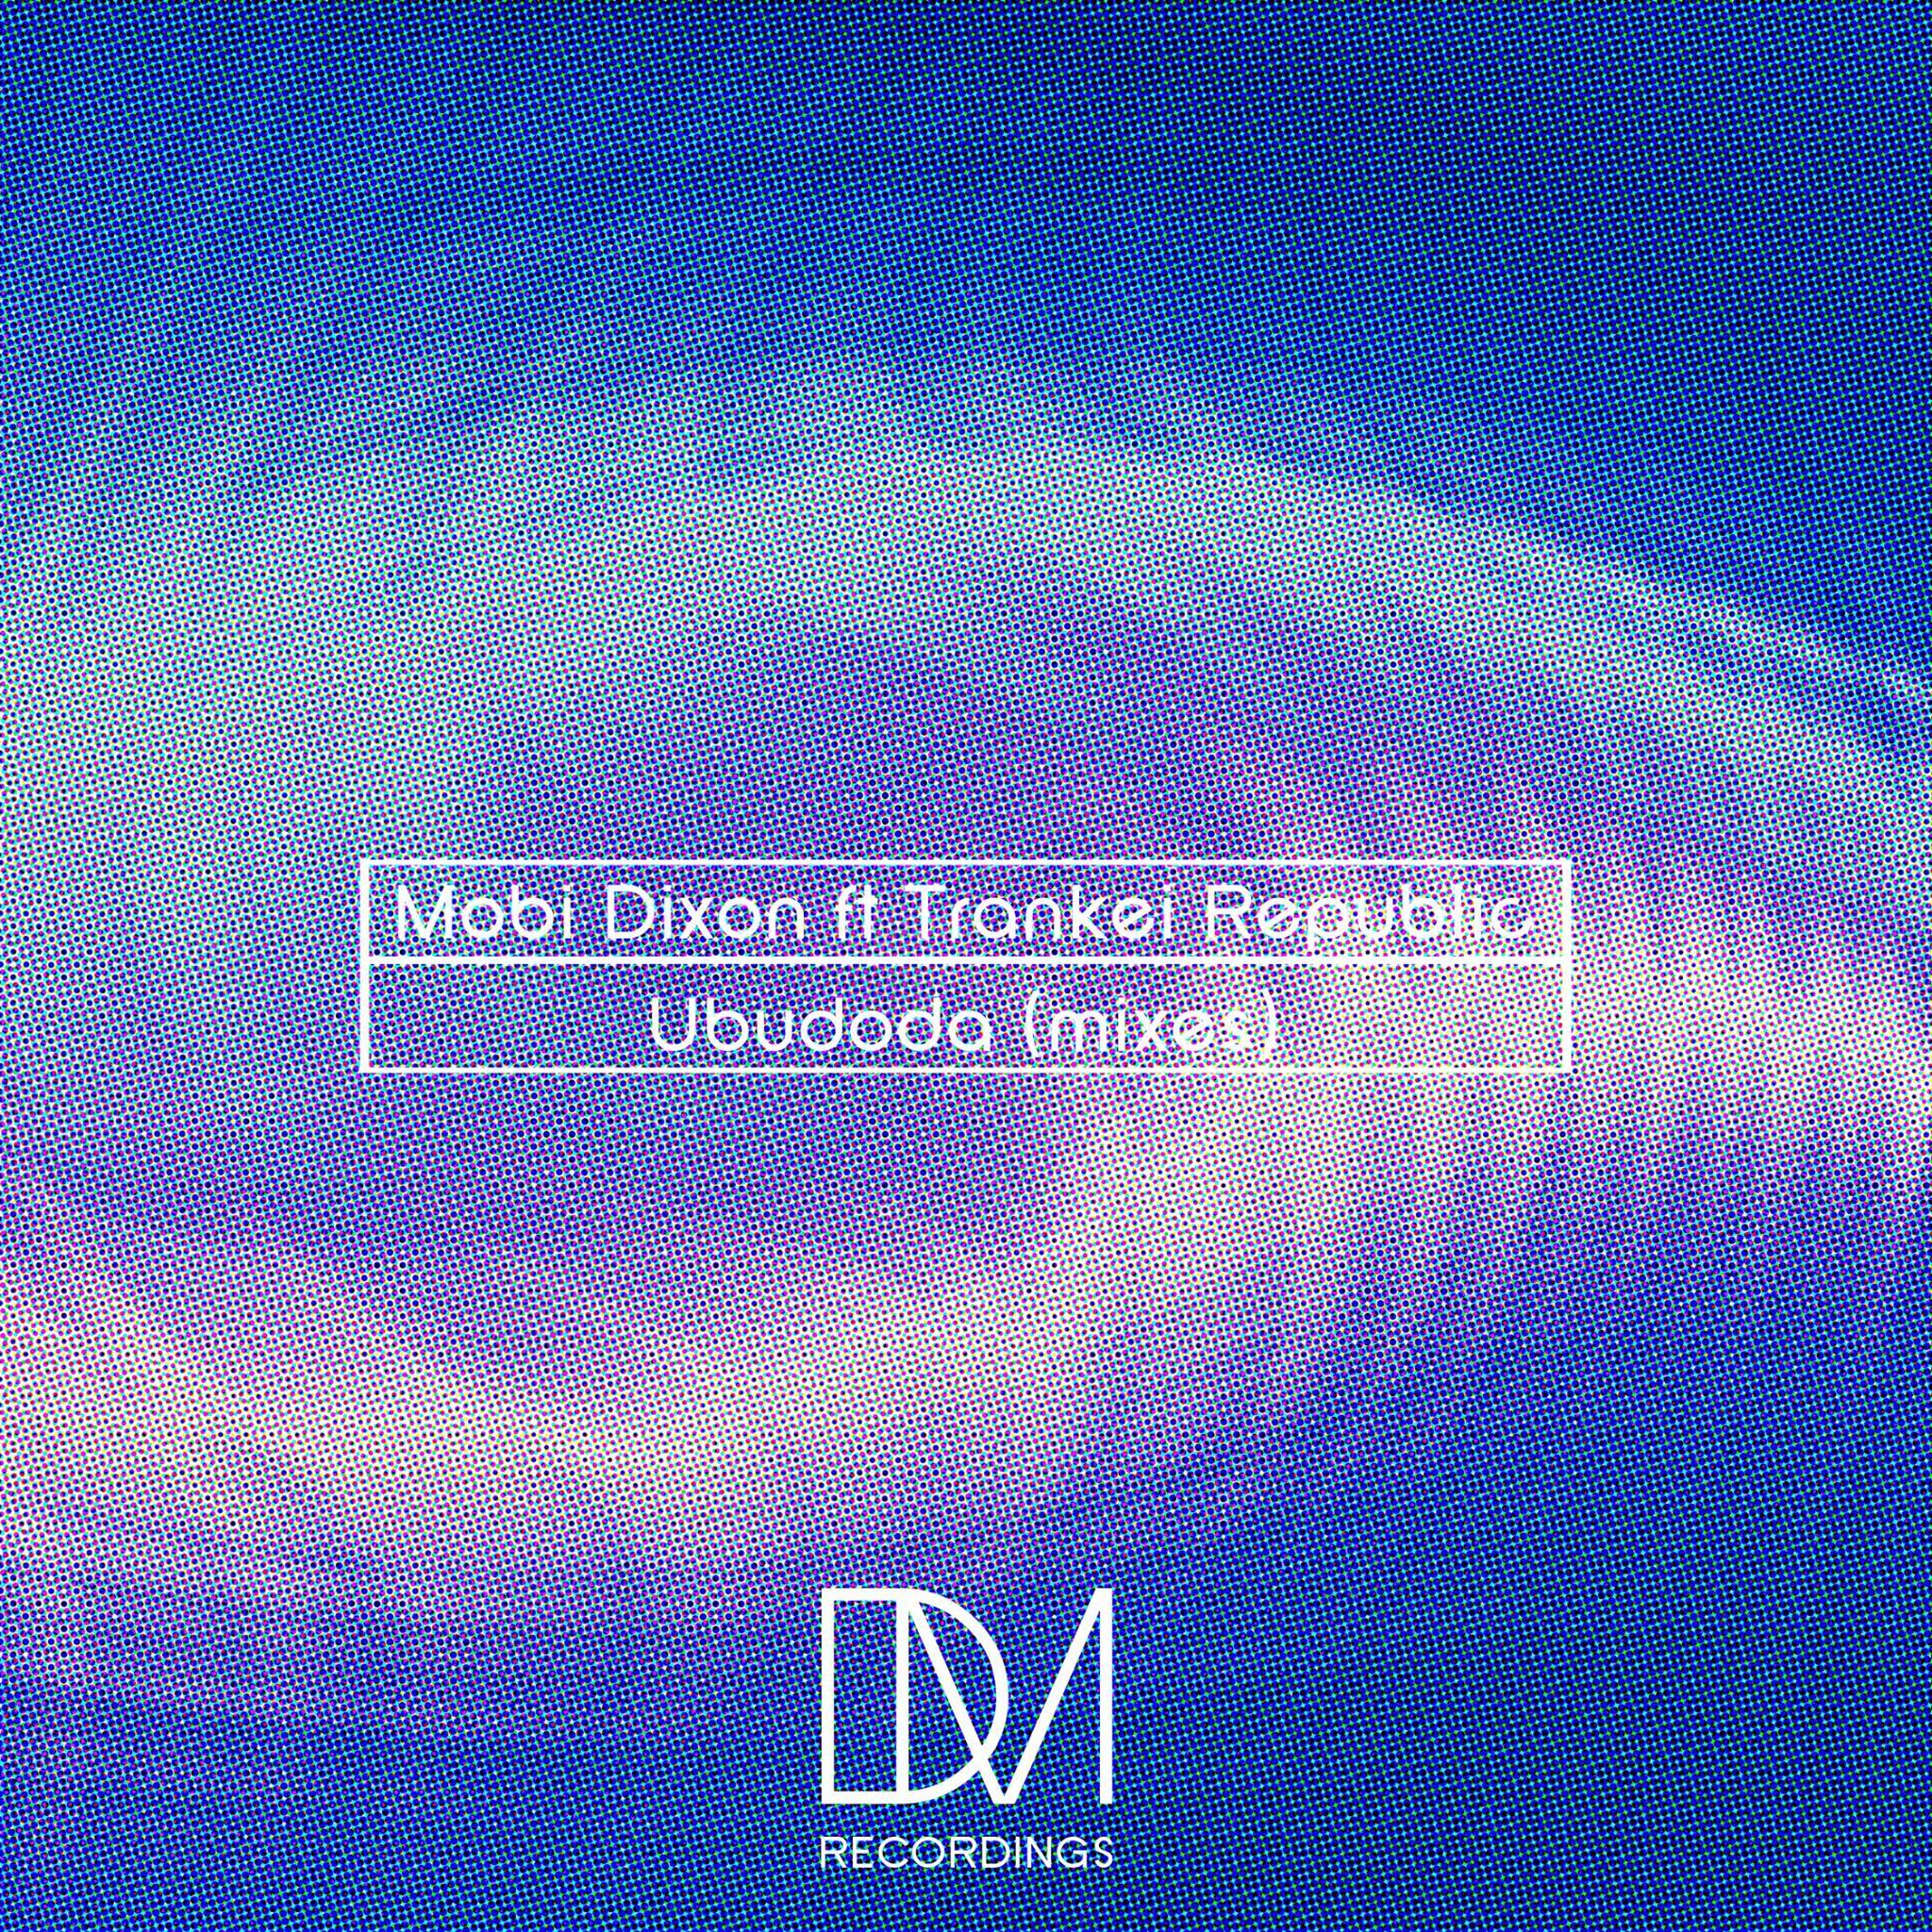 Mobi Dixon Feat Trankei Republic – Ubudoda (The Mixes)